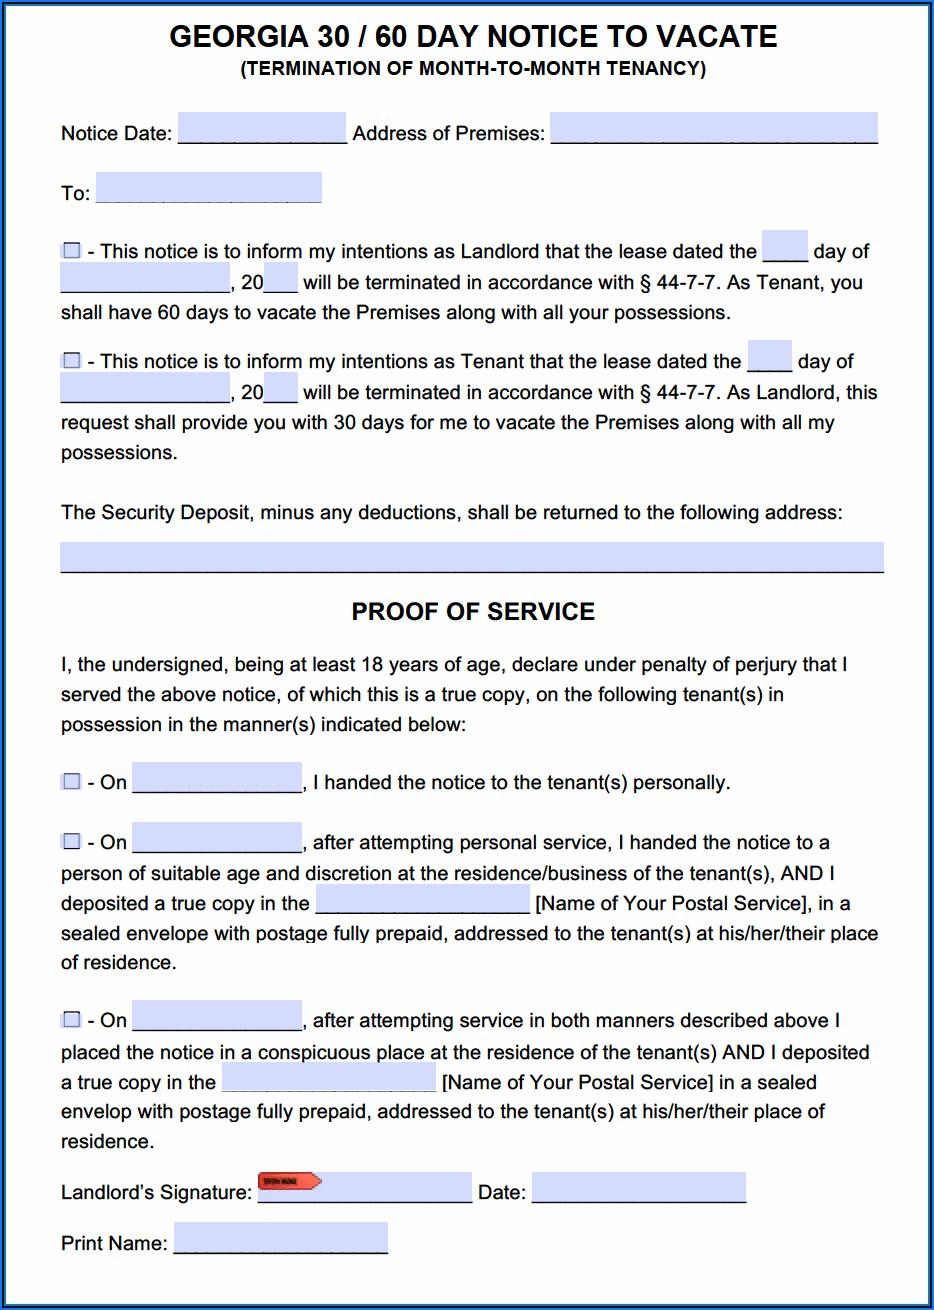 Georgia Eviction Notice Form